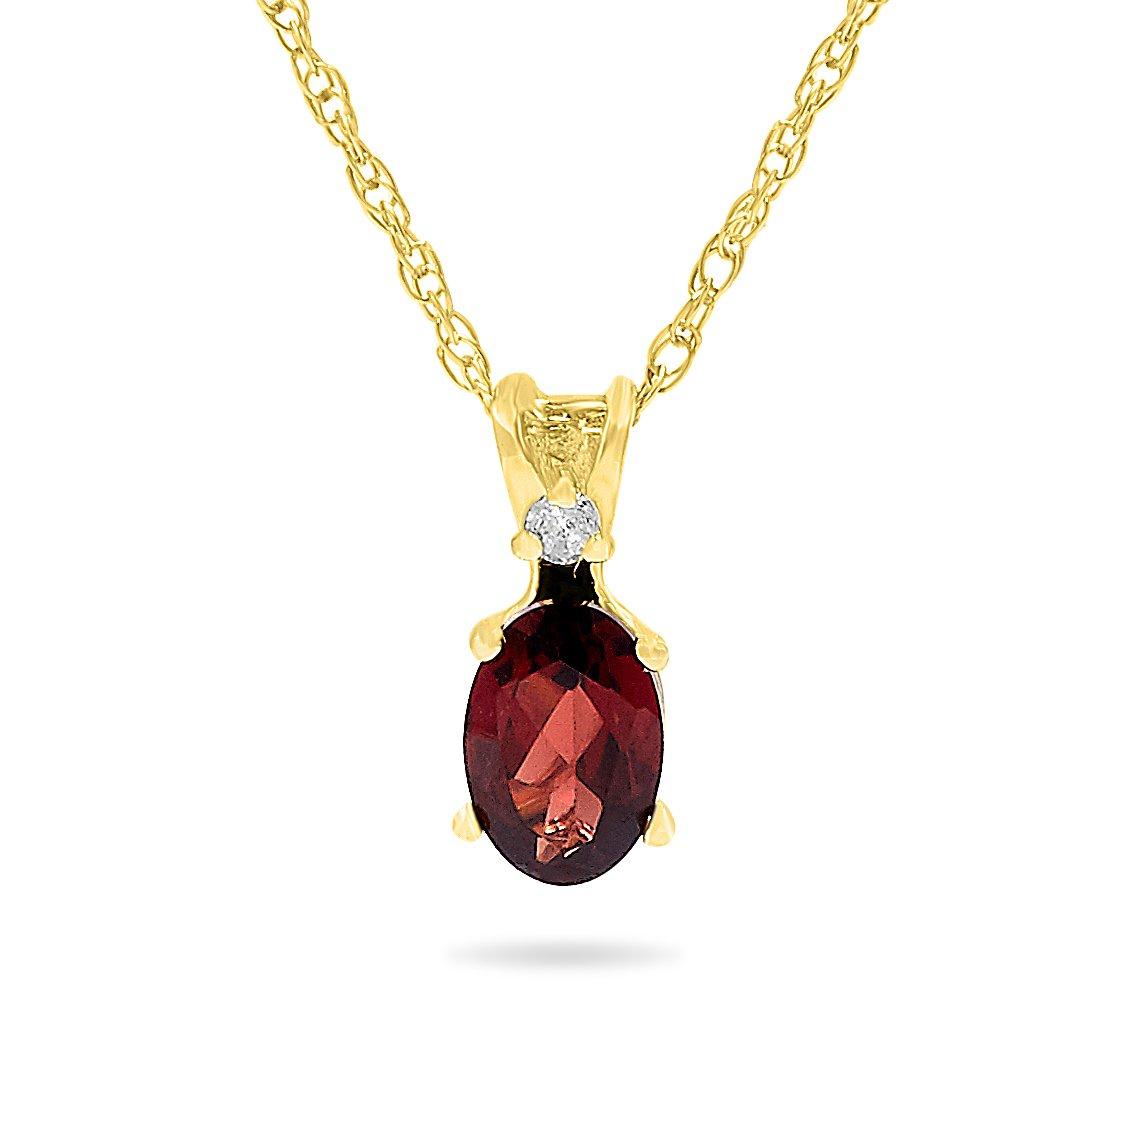 14k Yellow Gold Genuine Oval Garnet and Diamond Pendant, Birthstone of January, 18'' Chain